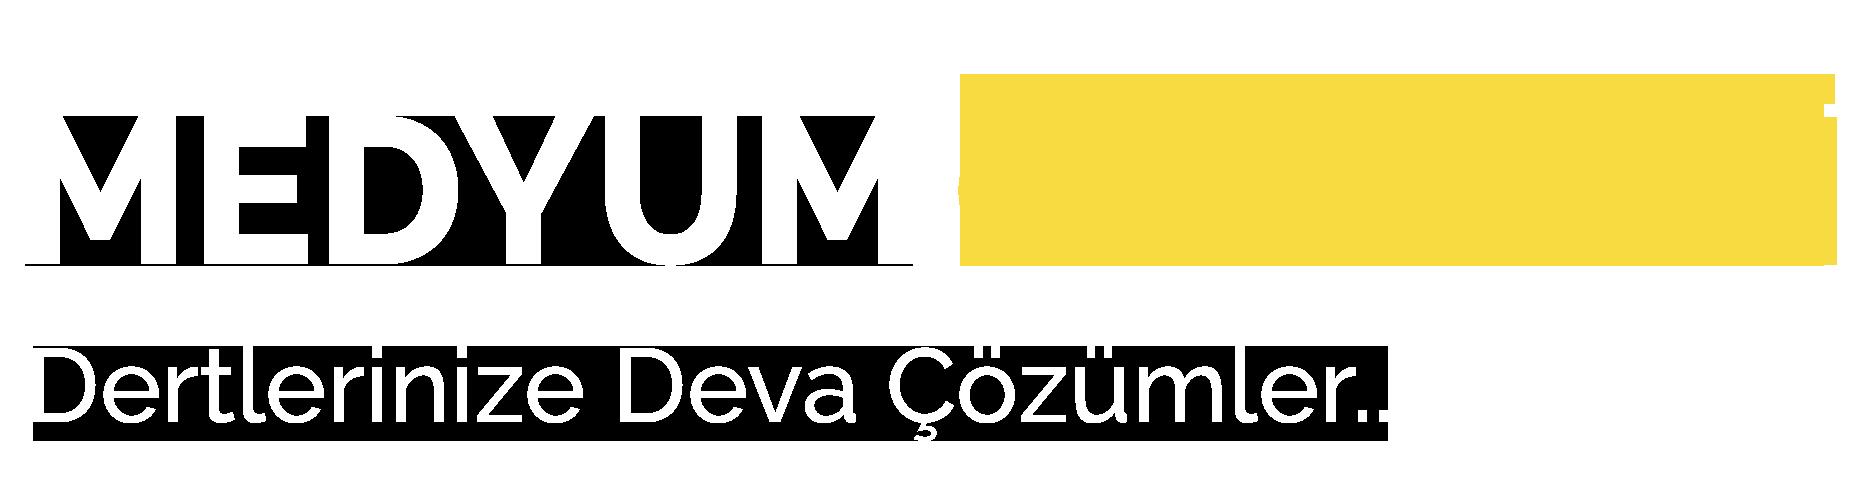 Medyum Geylani Hoca